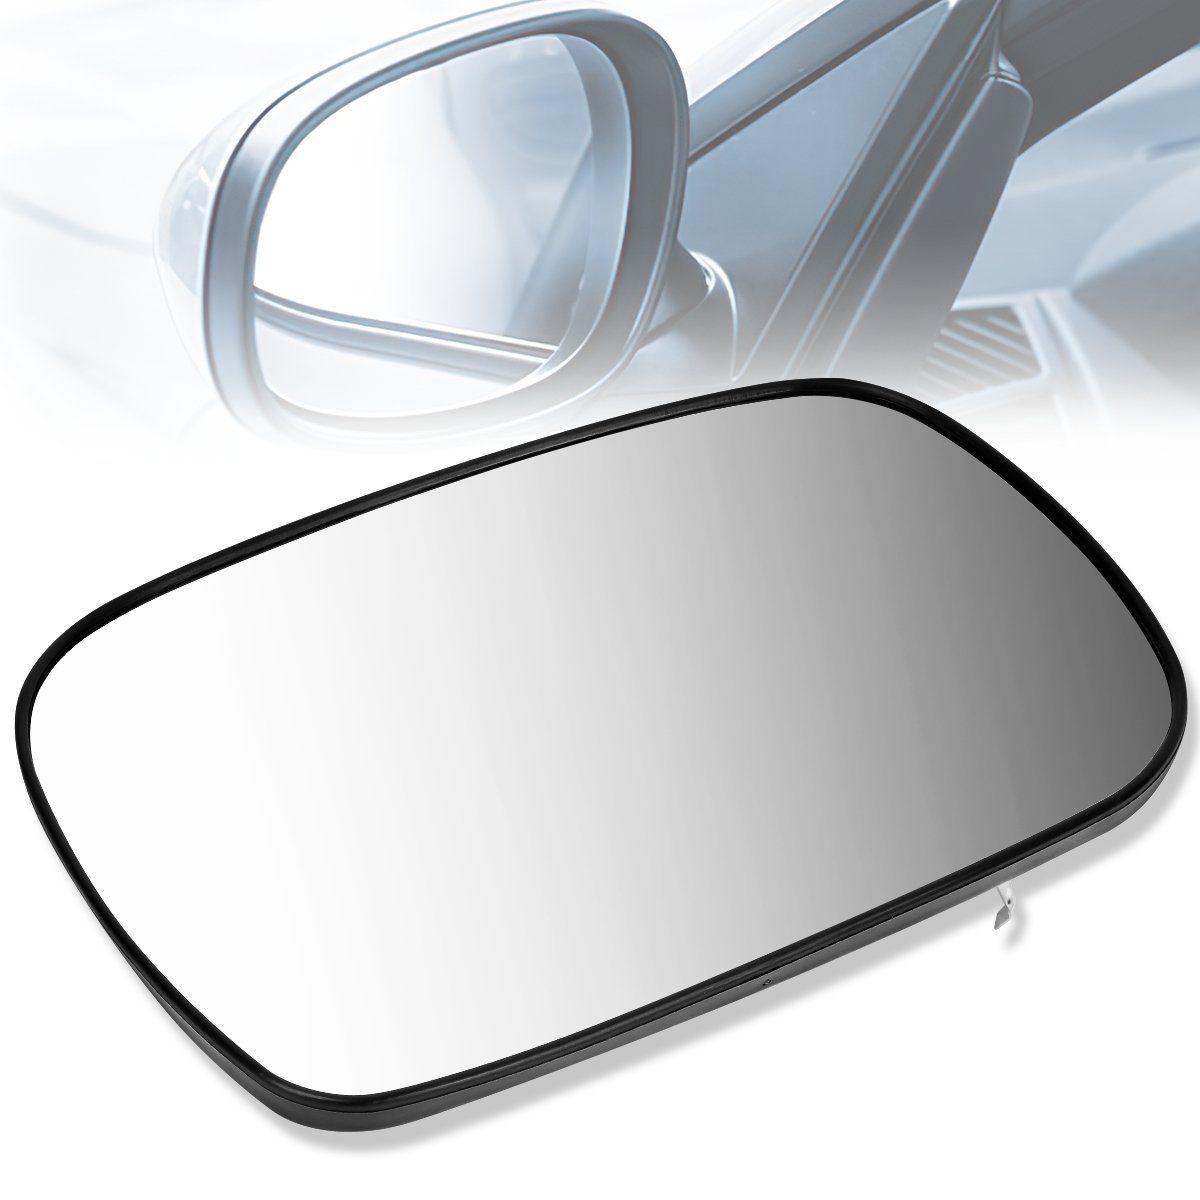 06 11 Honda Civic Coupe Right Passenger Side Door Mirror Glass W Heated 76203svac11 Honda Civic Coupe Civic Coupe Honda Civic